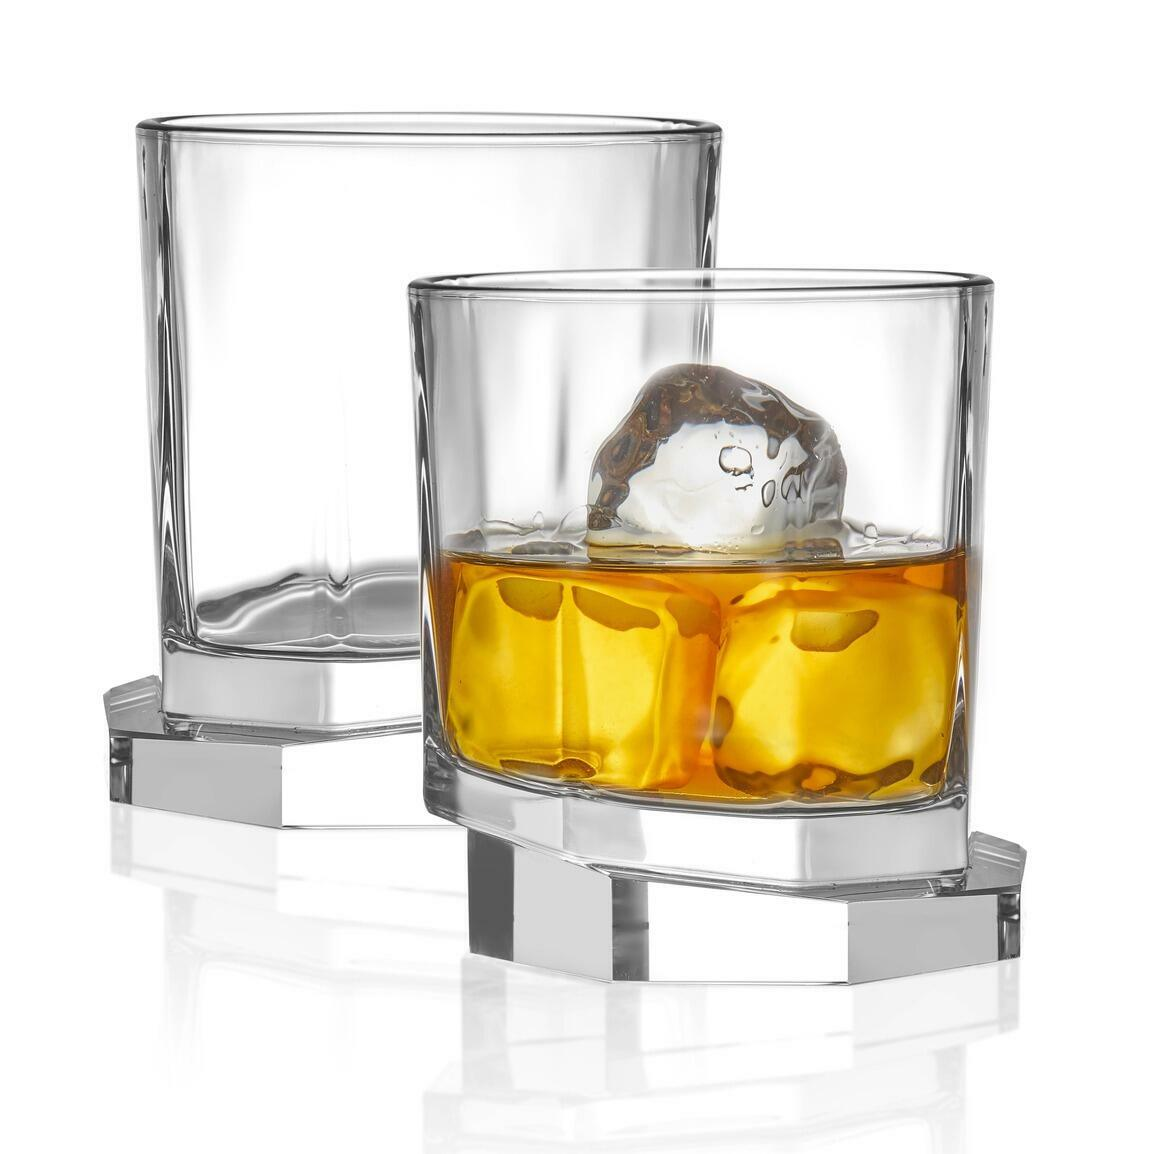 Aqua Vitae Octagon Crystal Whiskey Glass, 10.5oz (Set of 2)  | Trada Marketplace